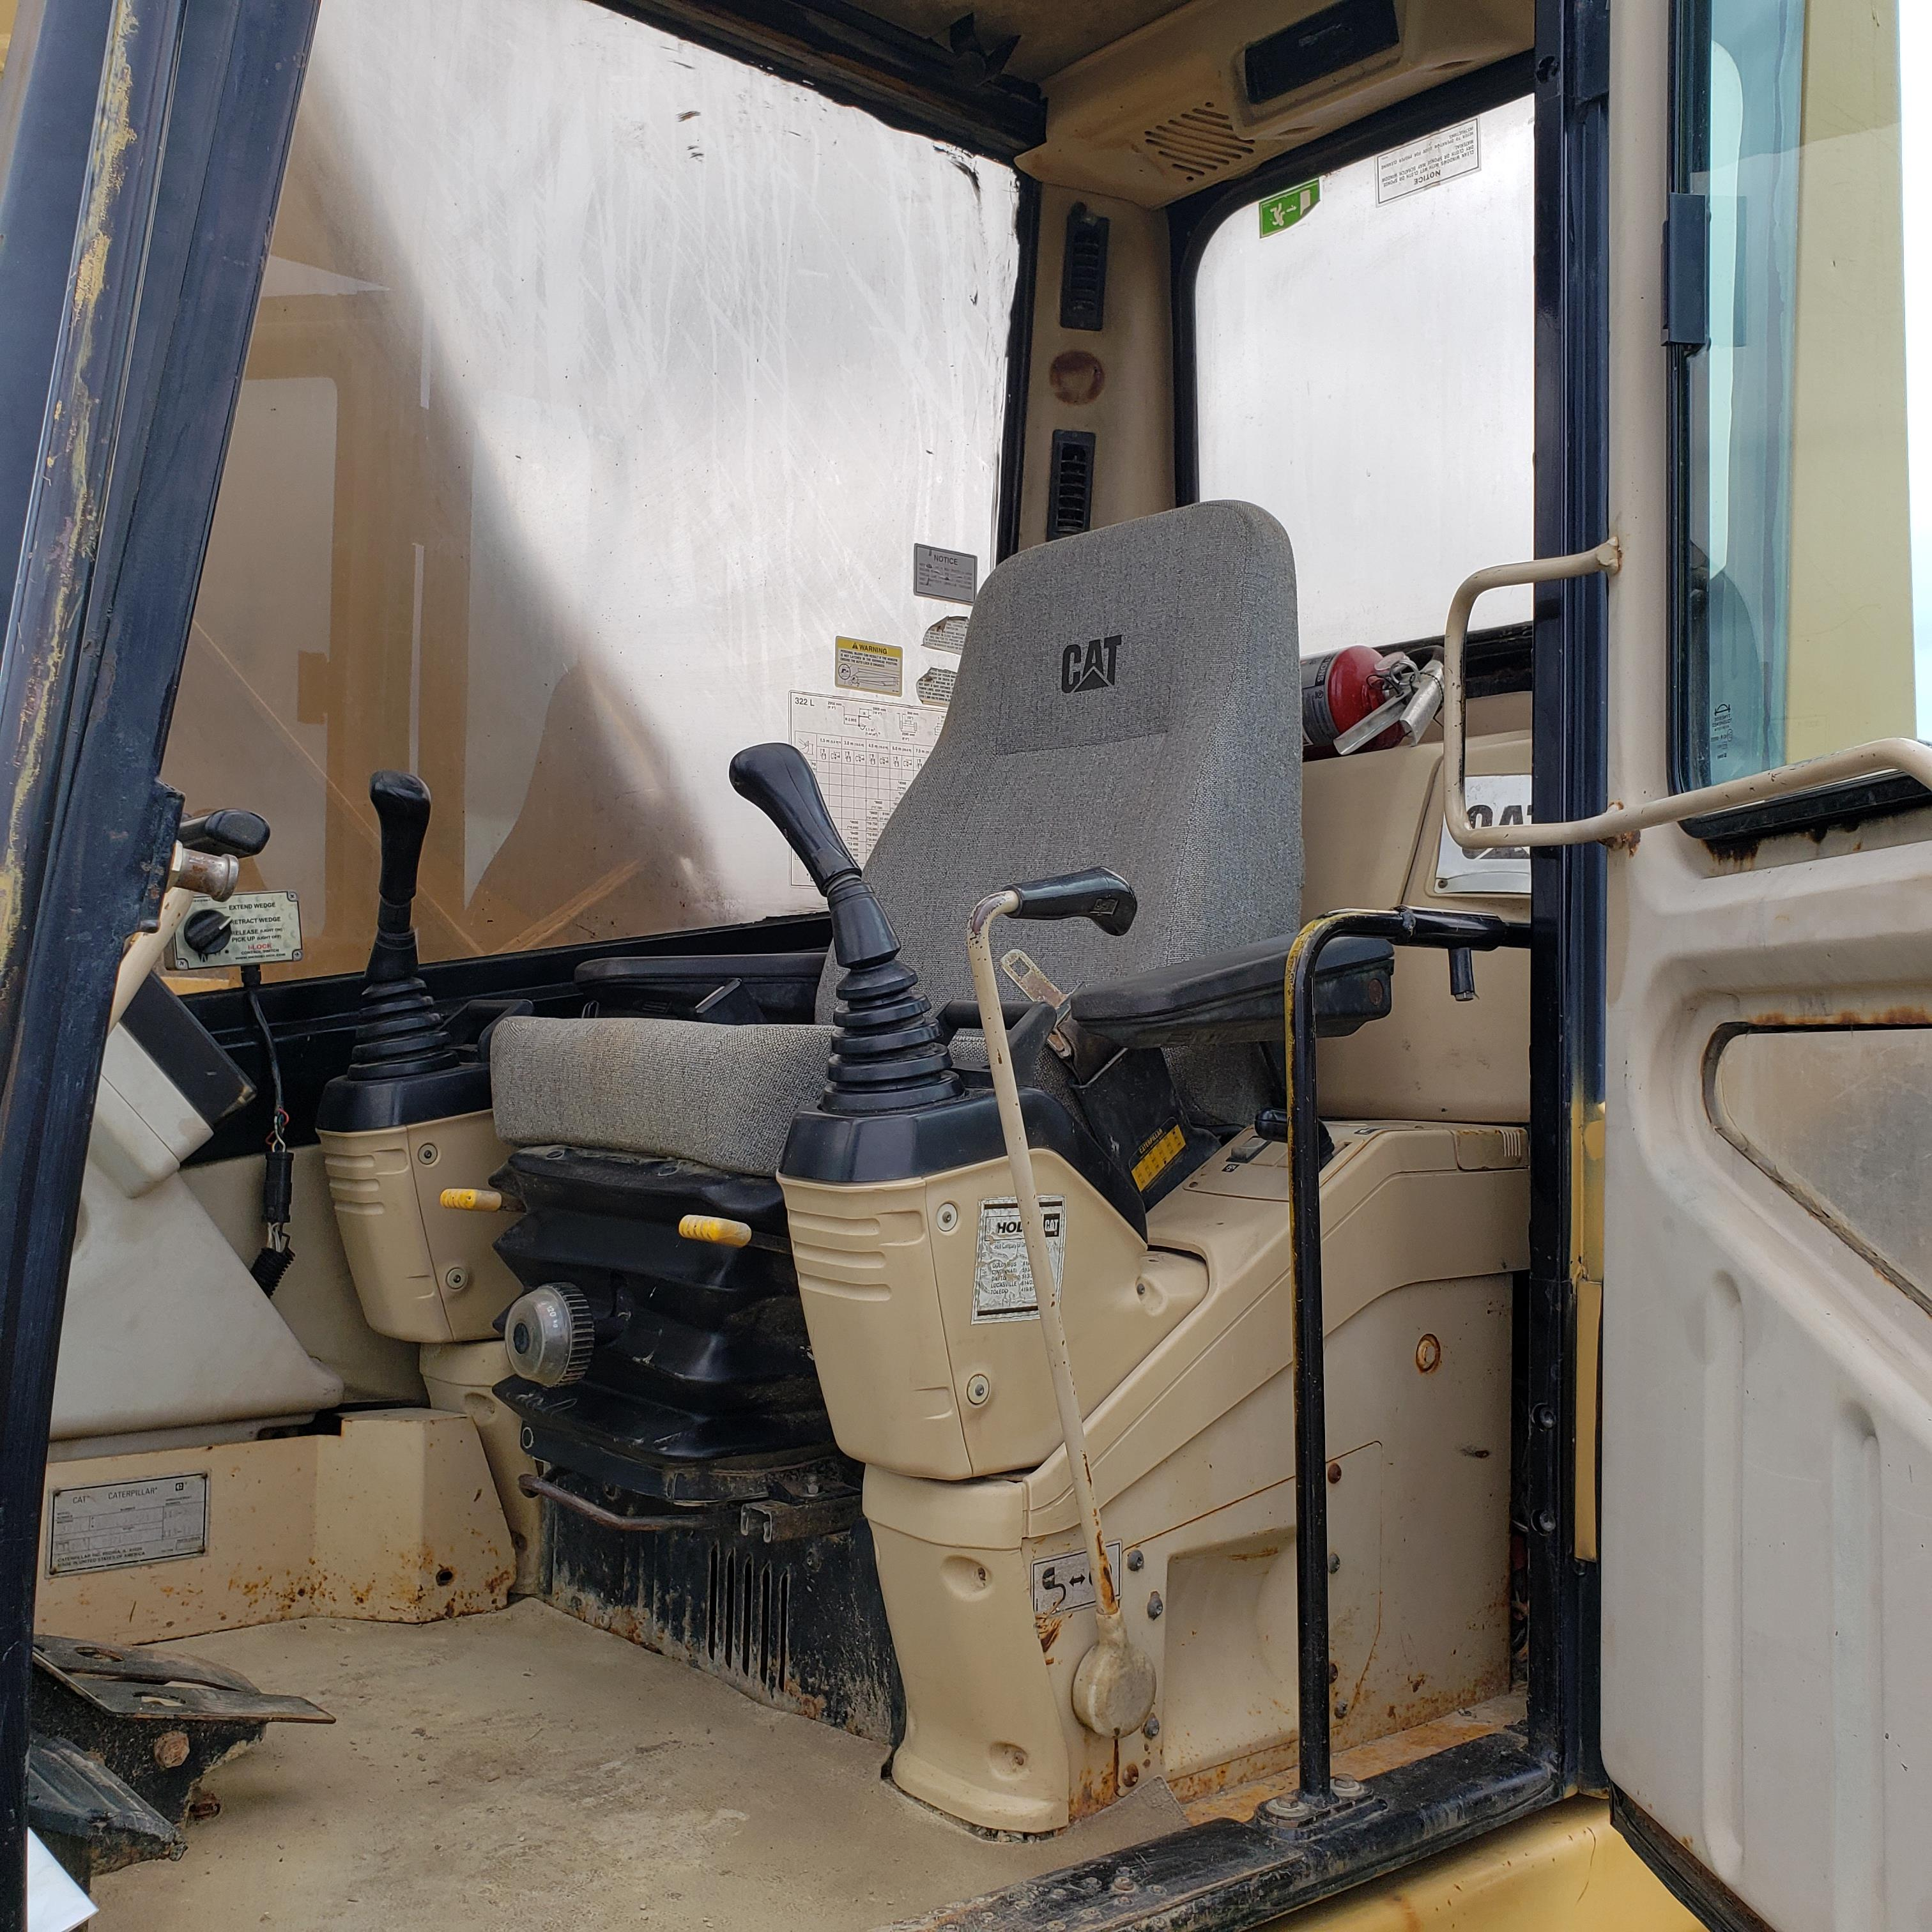 1996 Caterpillar 322L Hydraulic Excavator, Enclosed Cab, 28 in Bucket, Cat 3116 Engine, 9579 Hours - Image 11 of 18